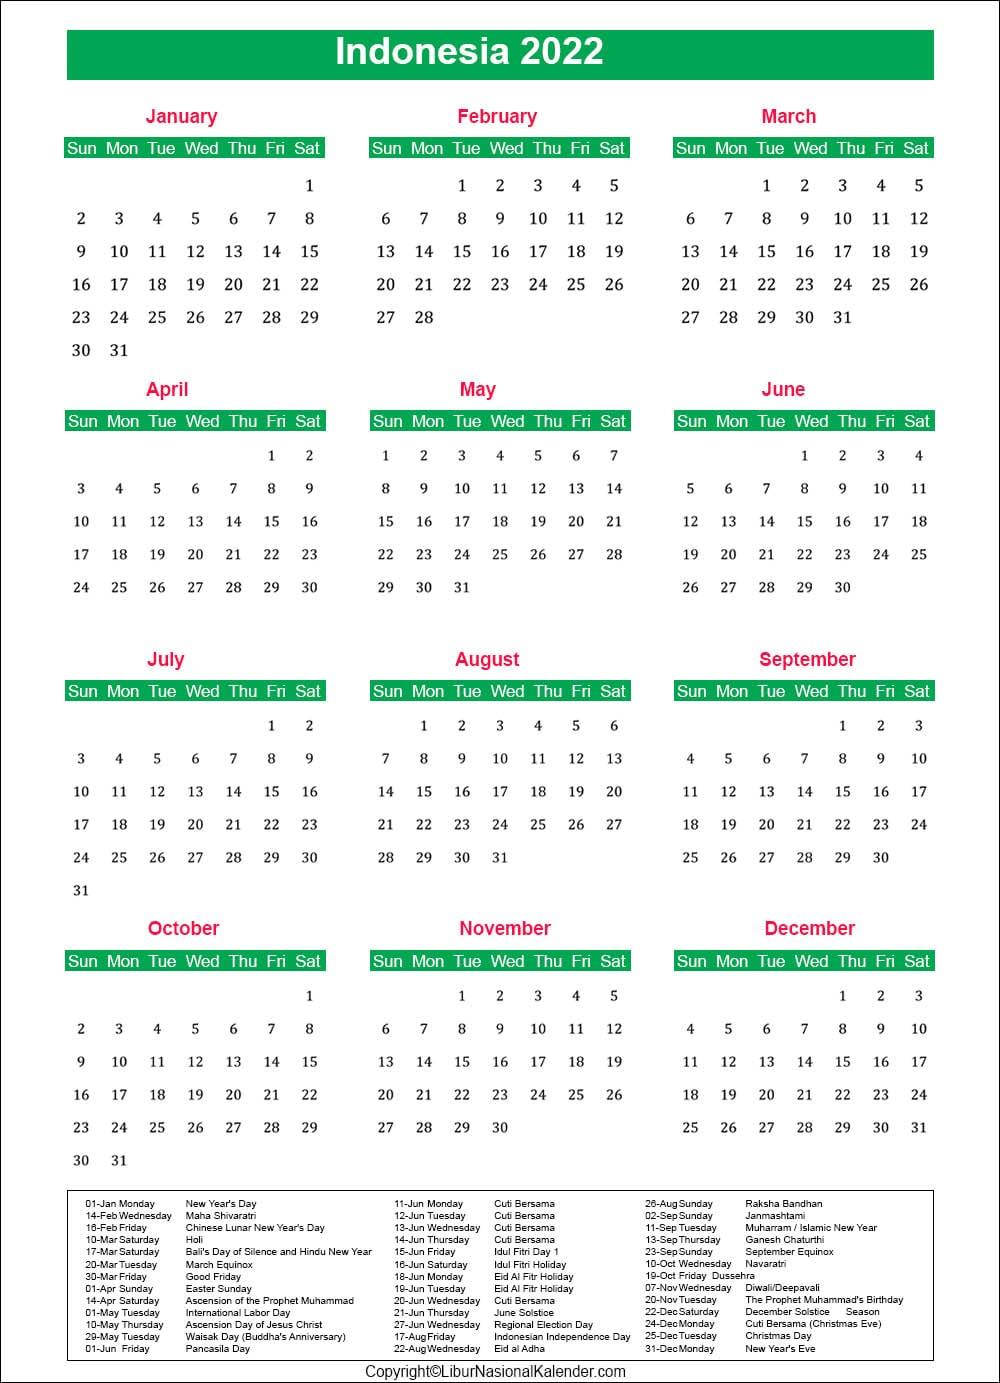 Indonesia Holiday Calendar 2022